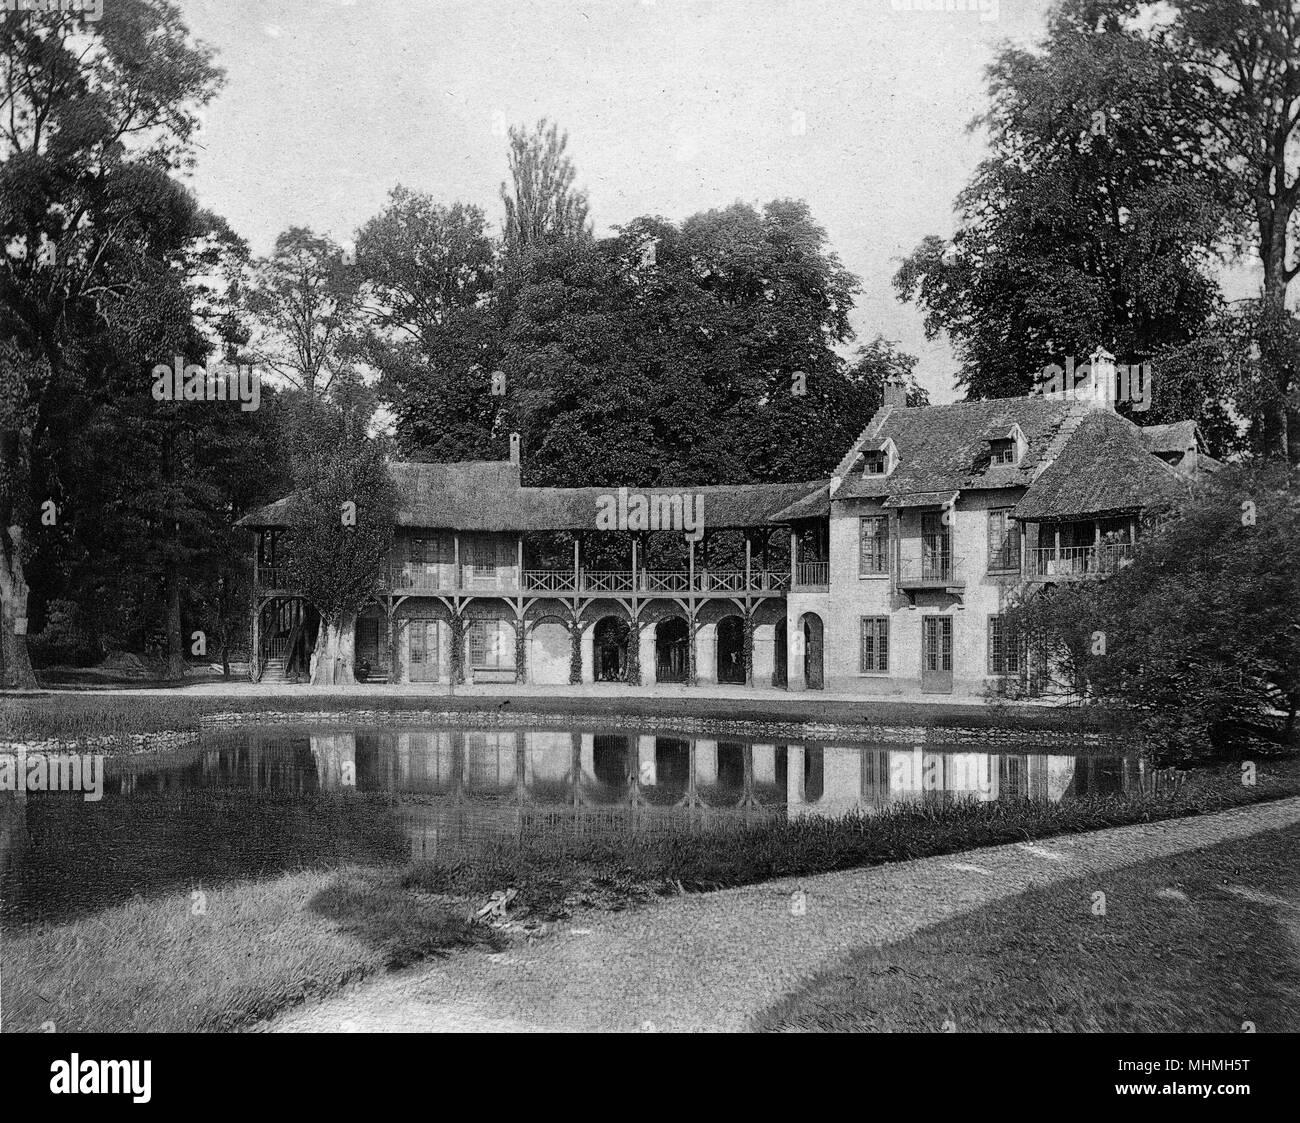 The Hameau.       Date: 1900 - Stock Image